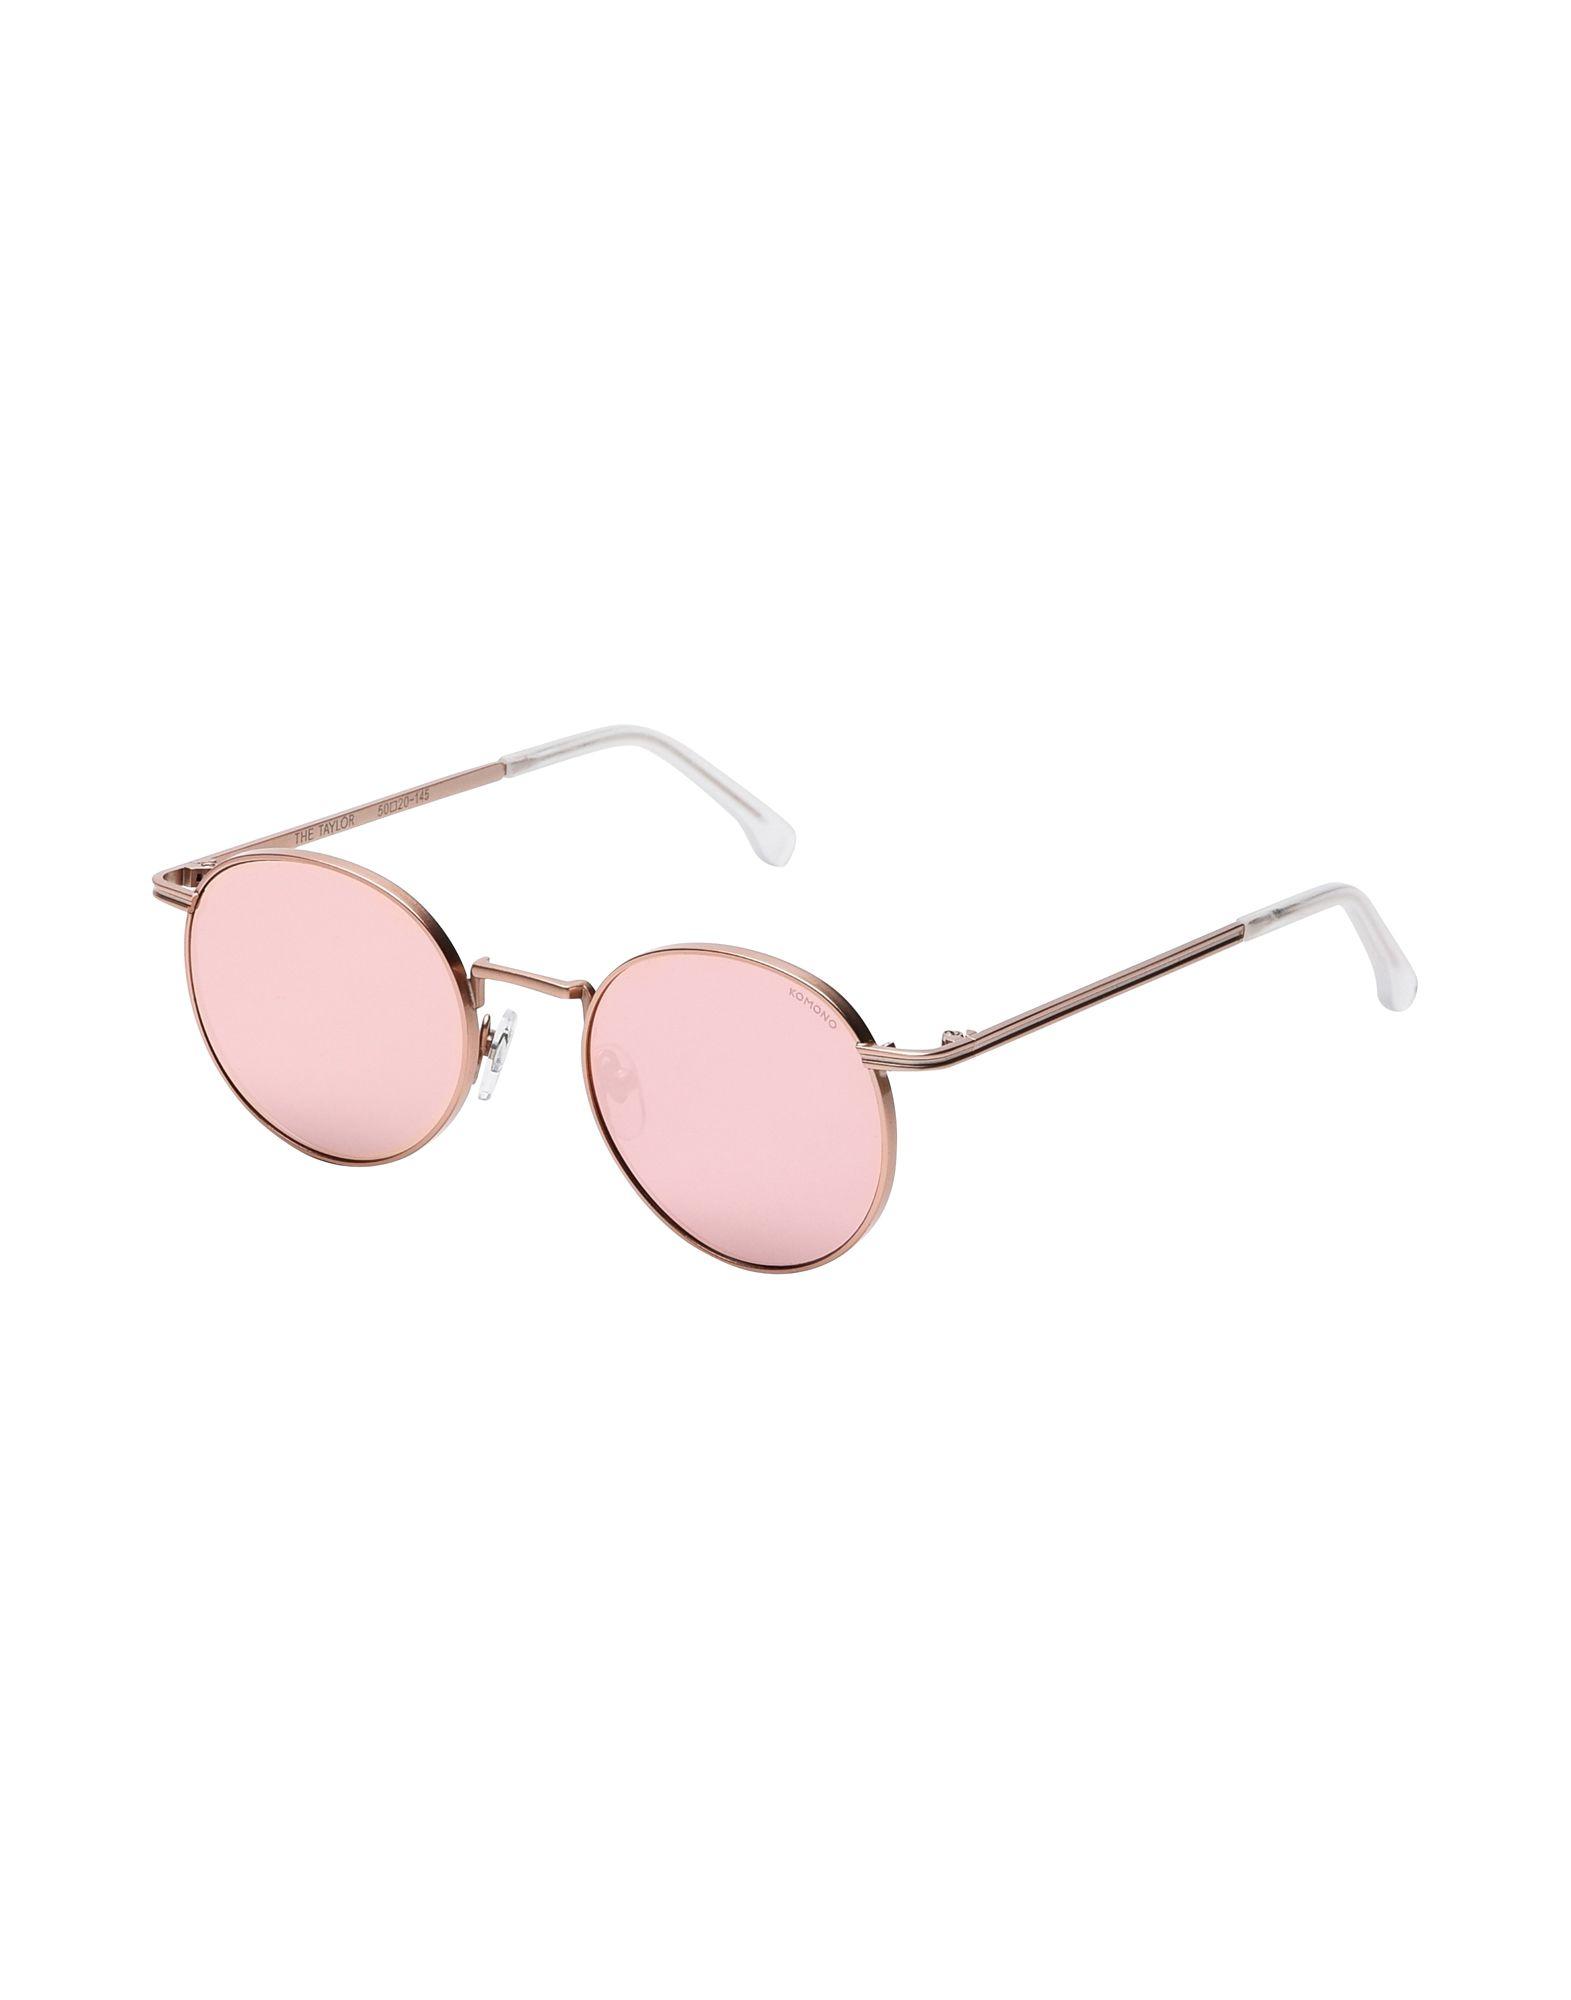 KOMONO Солнечные очки очки komono bennet ss16 midnight blue rubber s1802